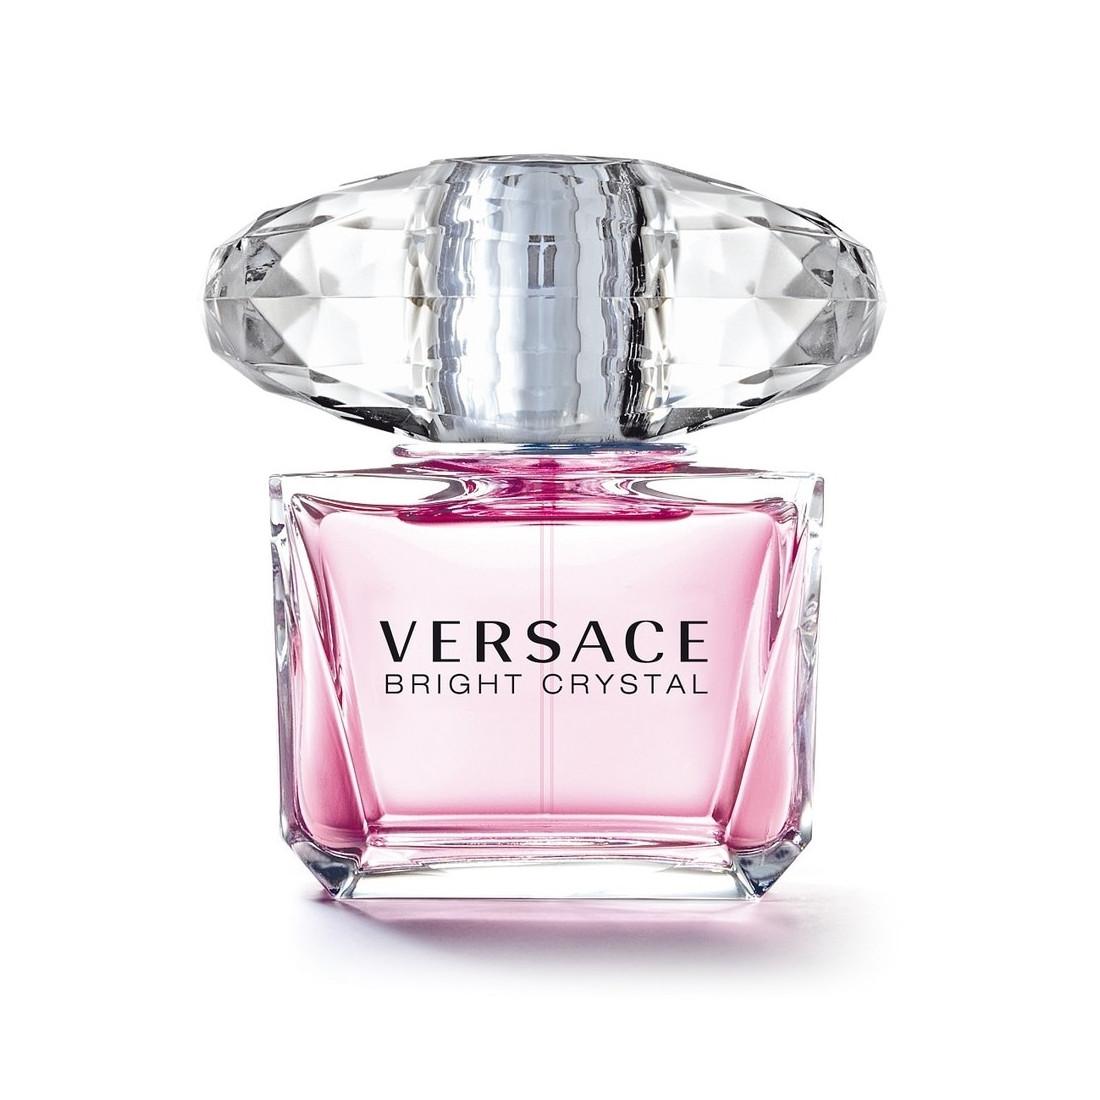 Versace Bright Crystal Eau De Toilette Spray 90 ml - Women Perfumes -  Perfumes